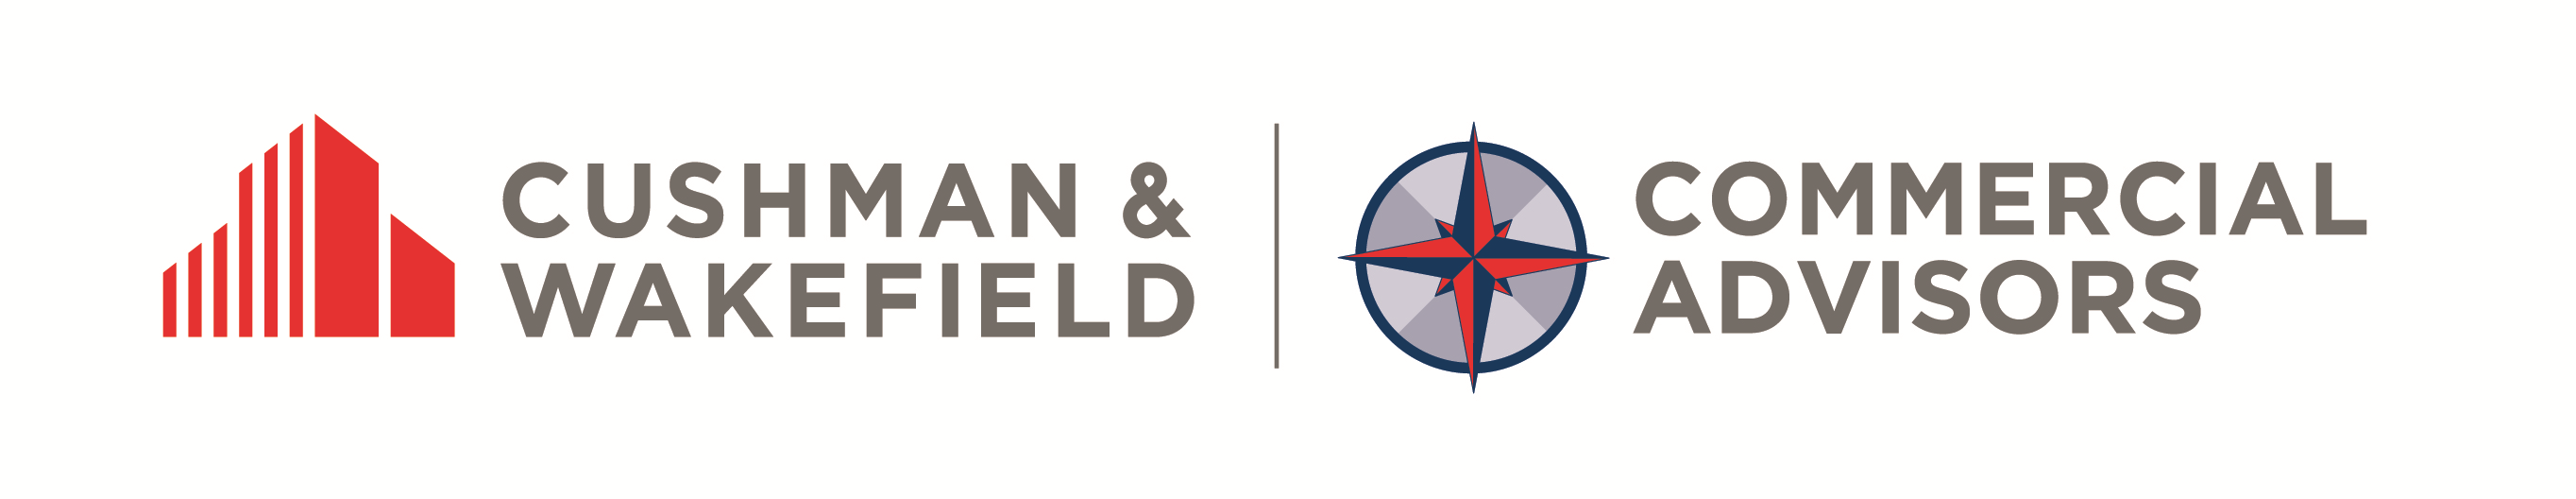 Cushman & Wakefield | Commercial Advisors logo